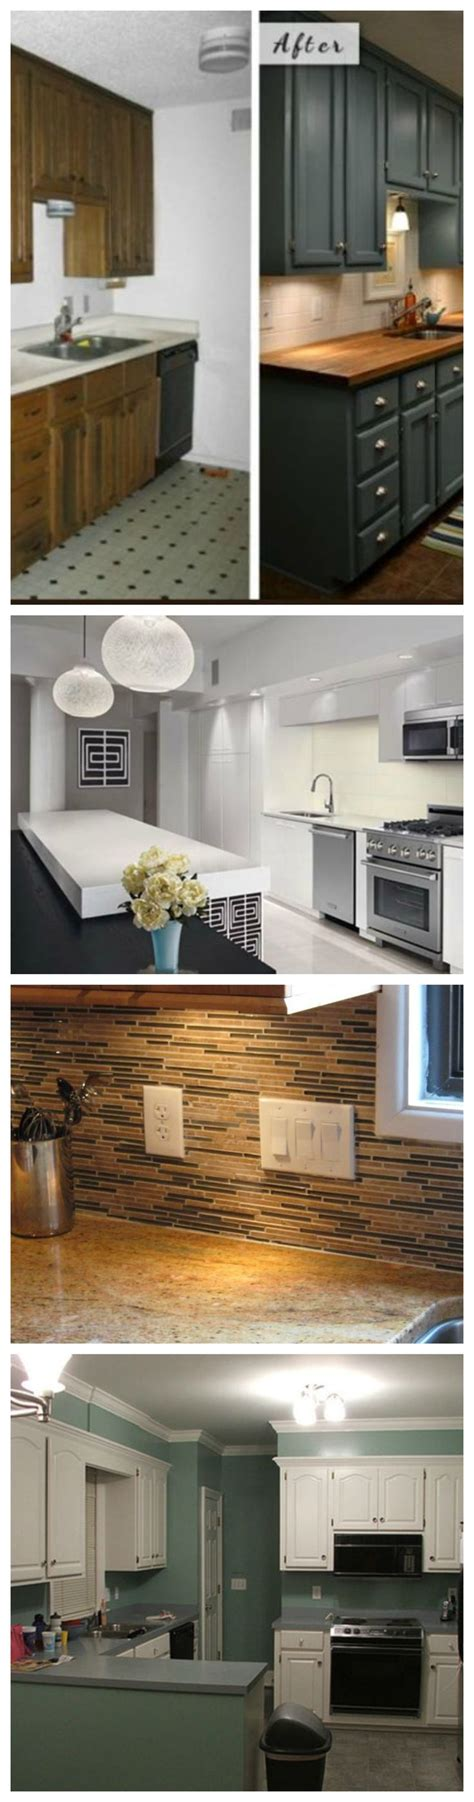 cheap kitchen reno ideas 10 cheap renovation ideas for your kitchen nice cheap